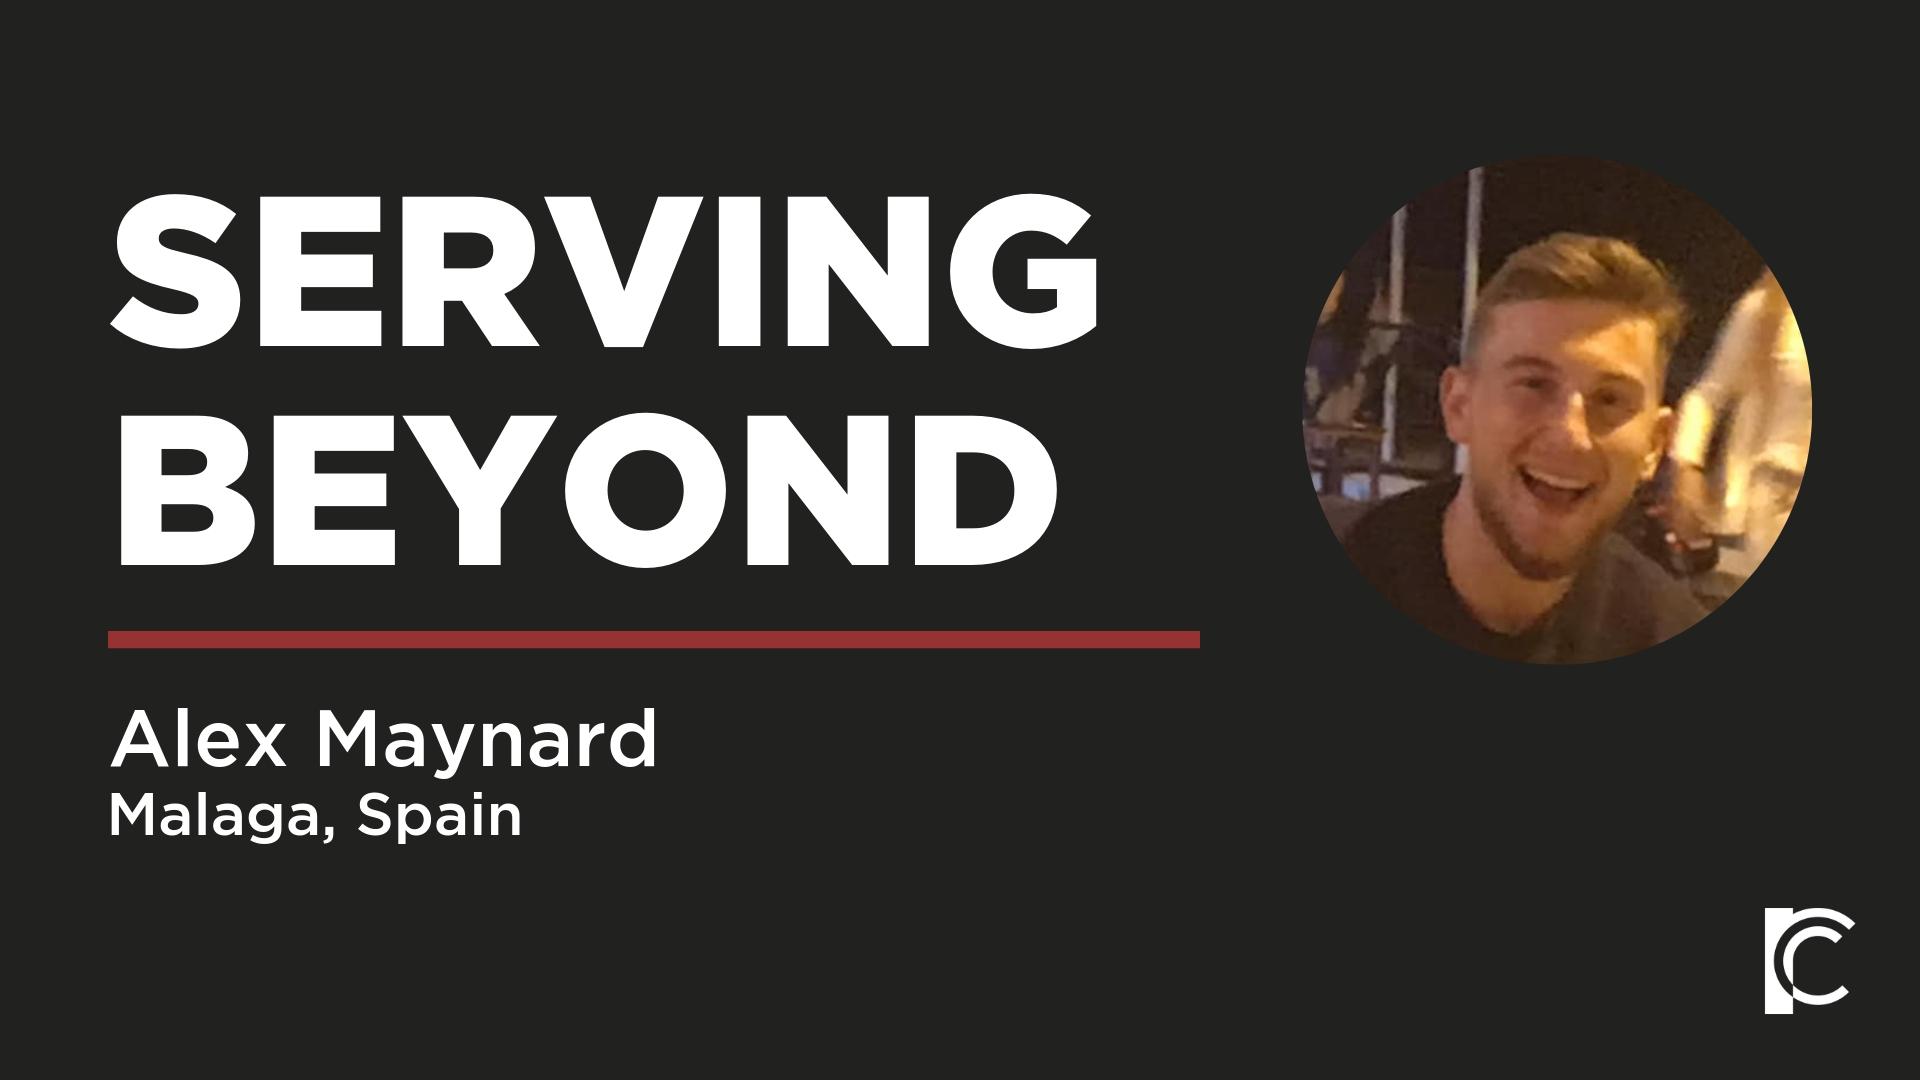 SERVING BEYOND (7).jpg